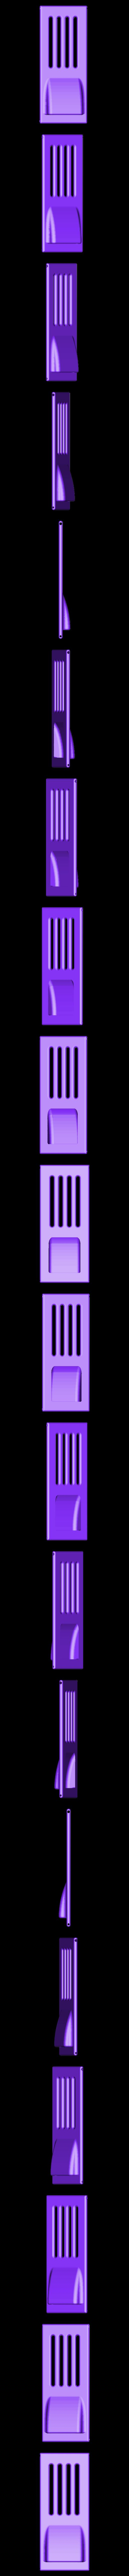 Nano_Drak_Side_Bay_V2.stl Descargar archivo STL Ritewing Nano Drak Print Bundle • Objeto imprimible en 3D, RobsLoco